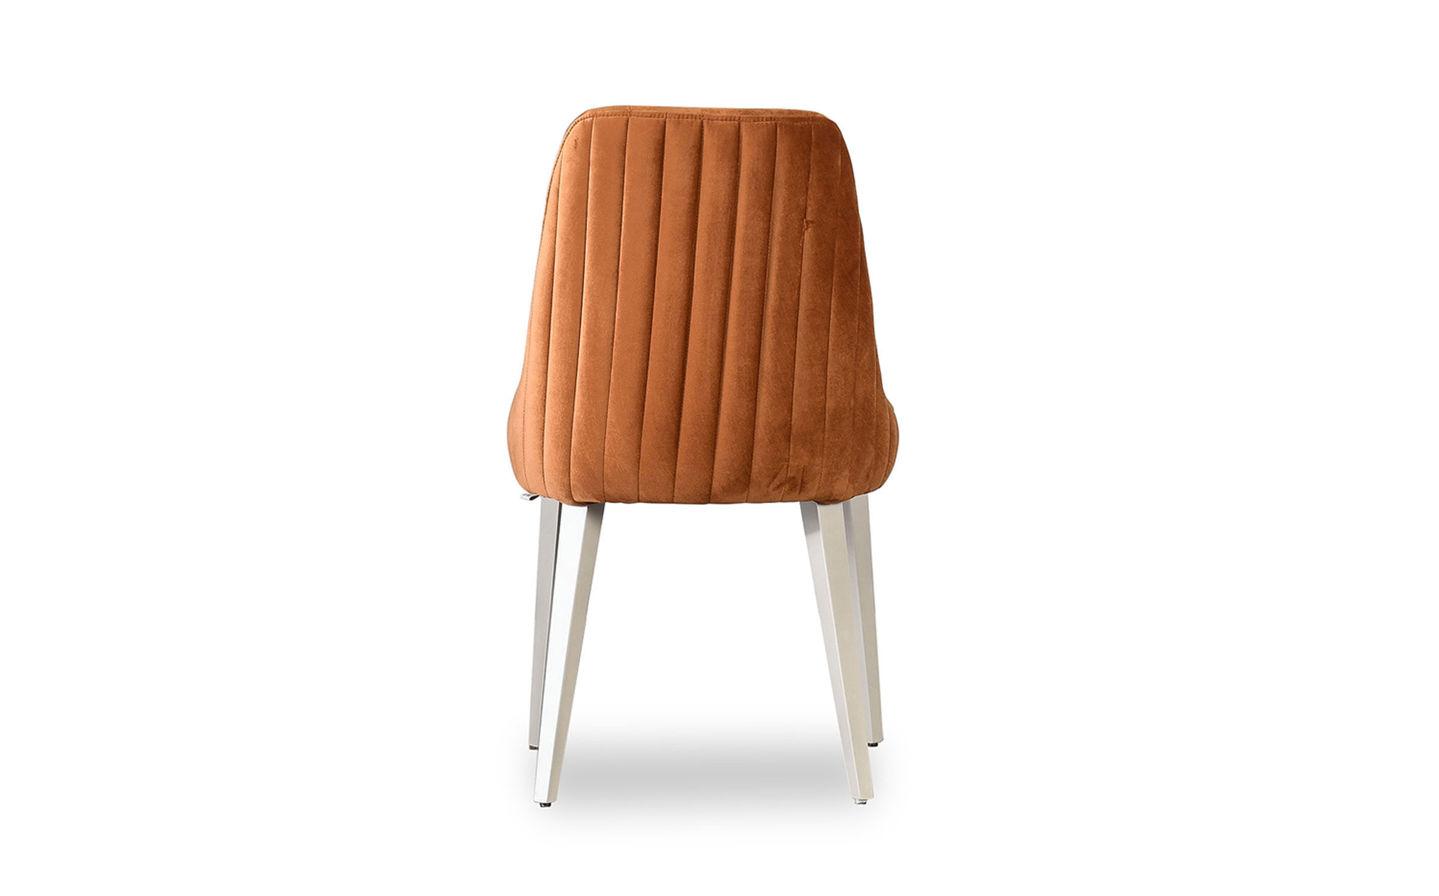 Essen Sandalye Sensitive Puket Taba